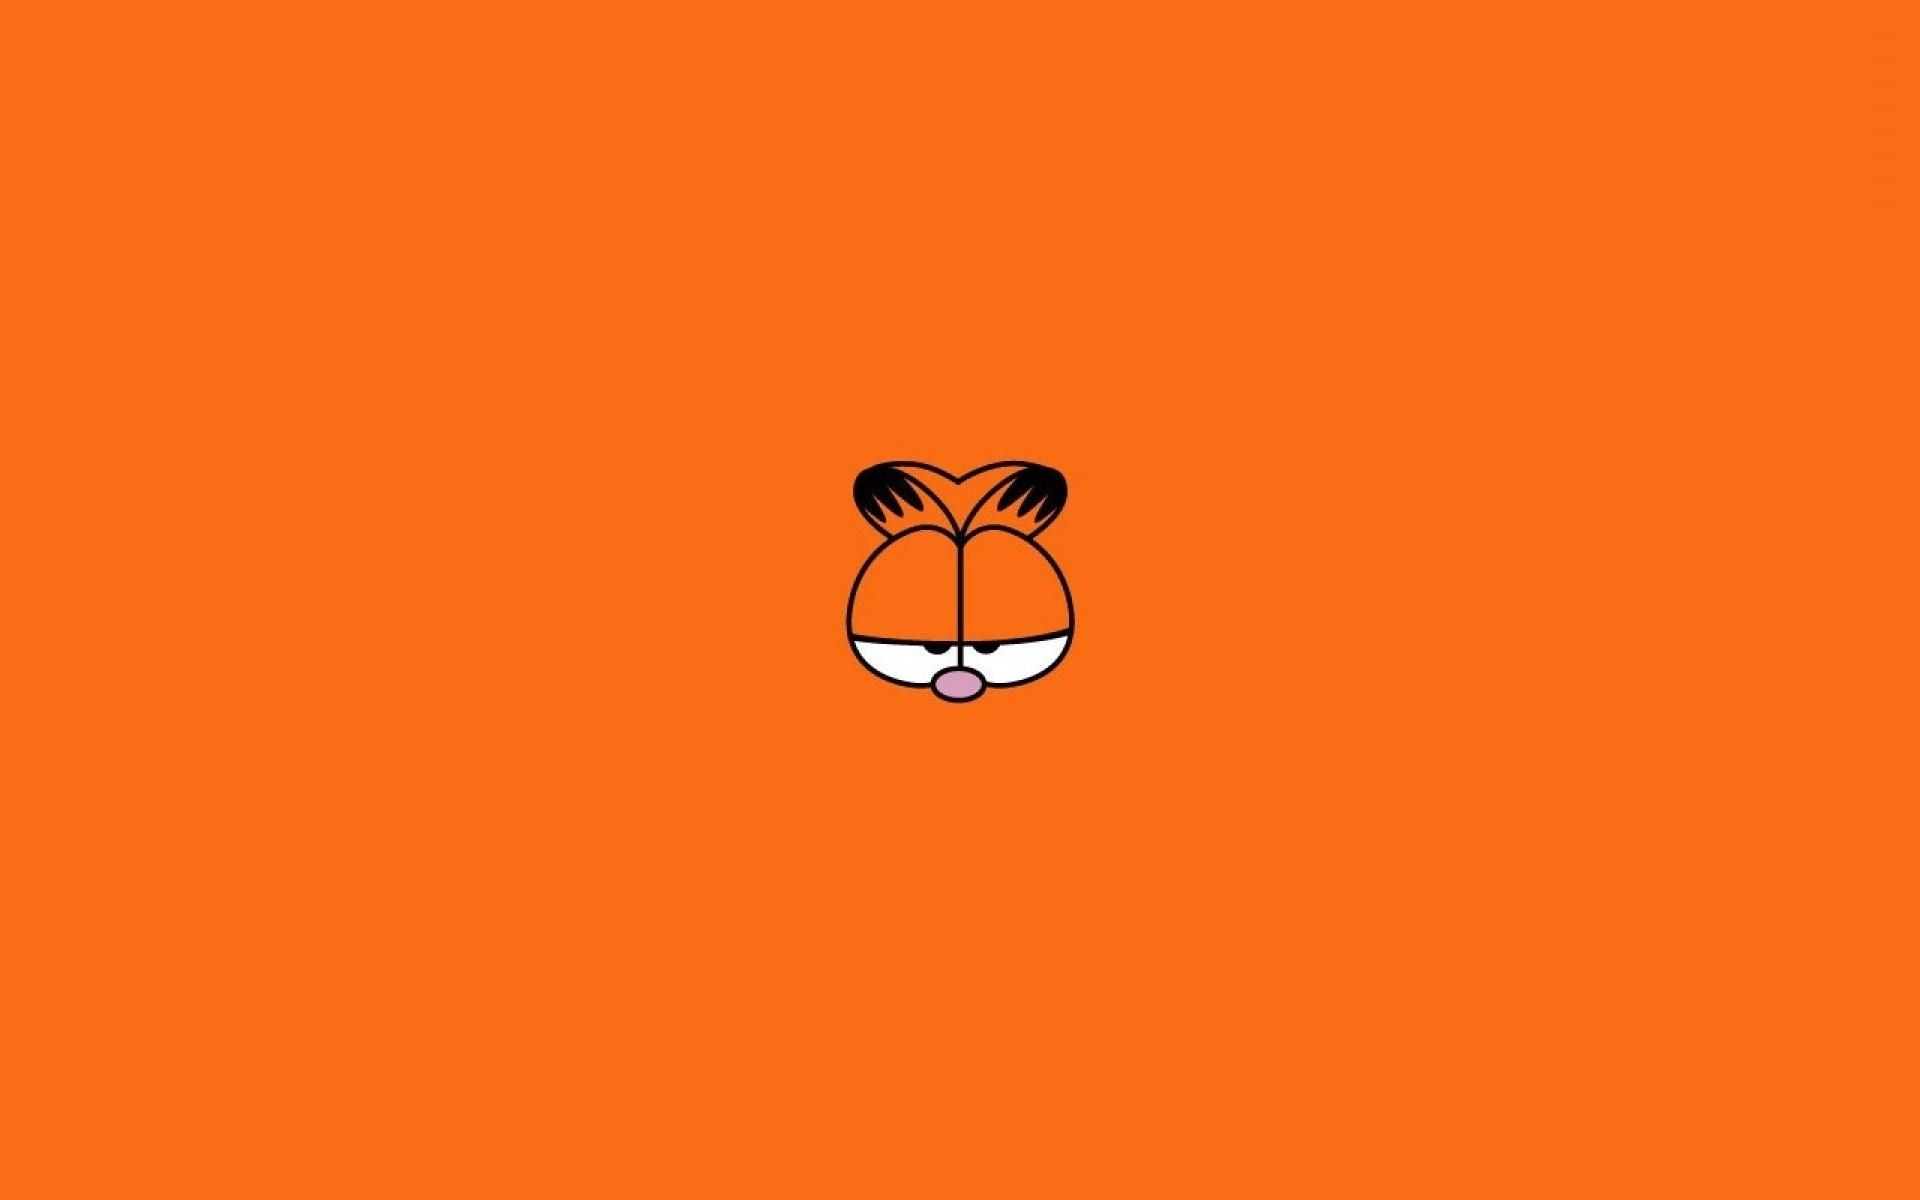 Garfield desktop wallpaper wallpapertag - Garfield wallpapers for mobile ...